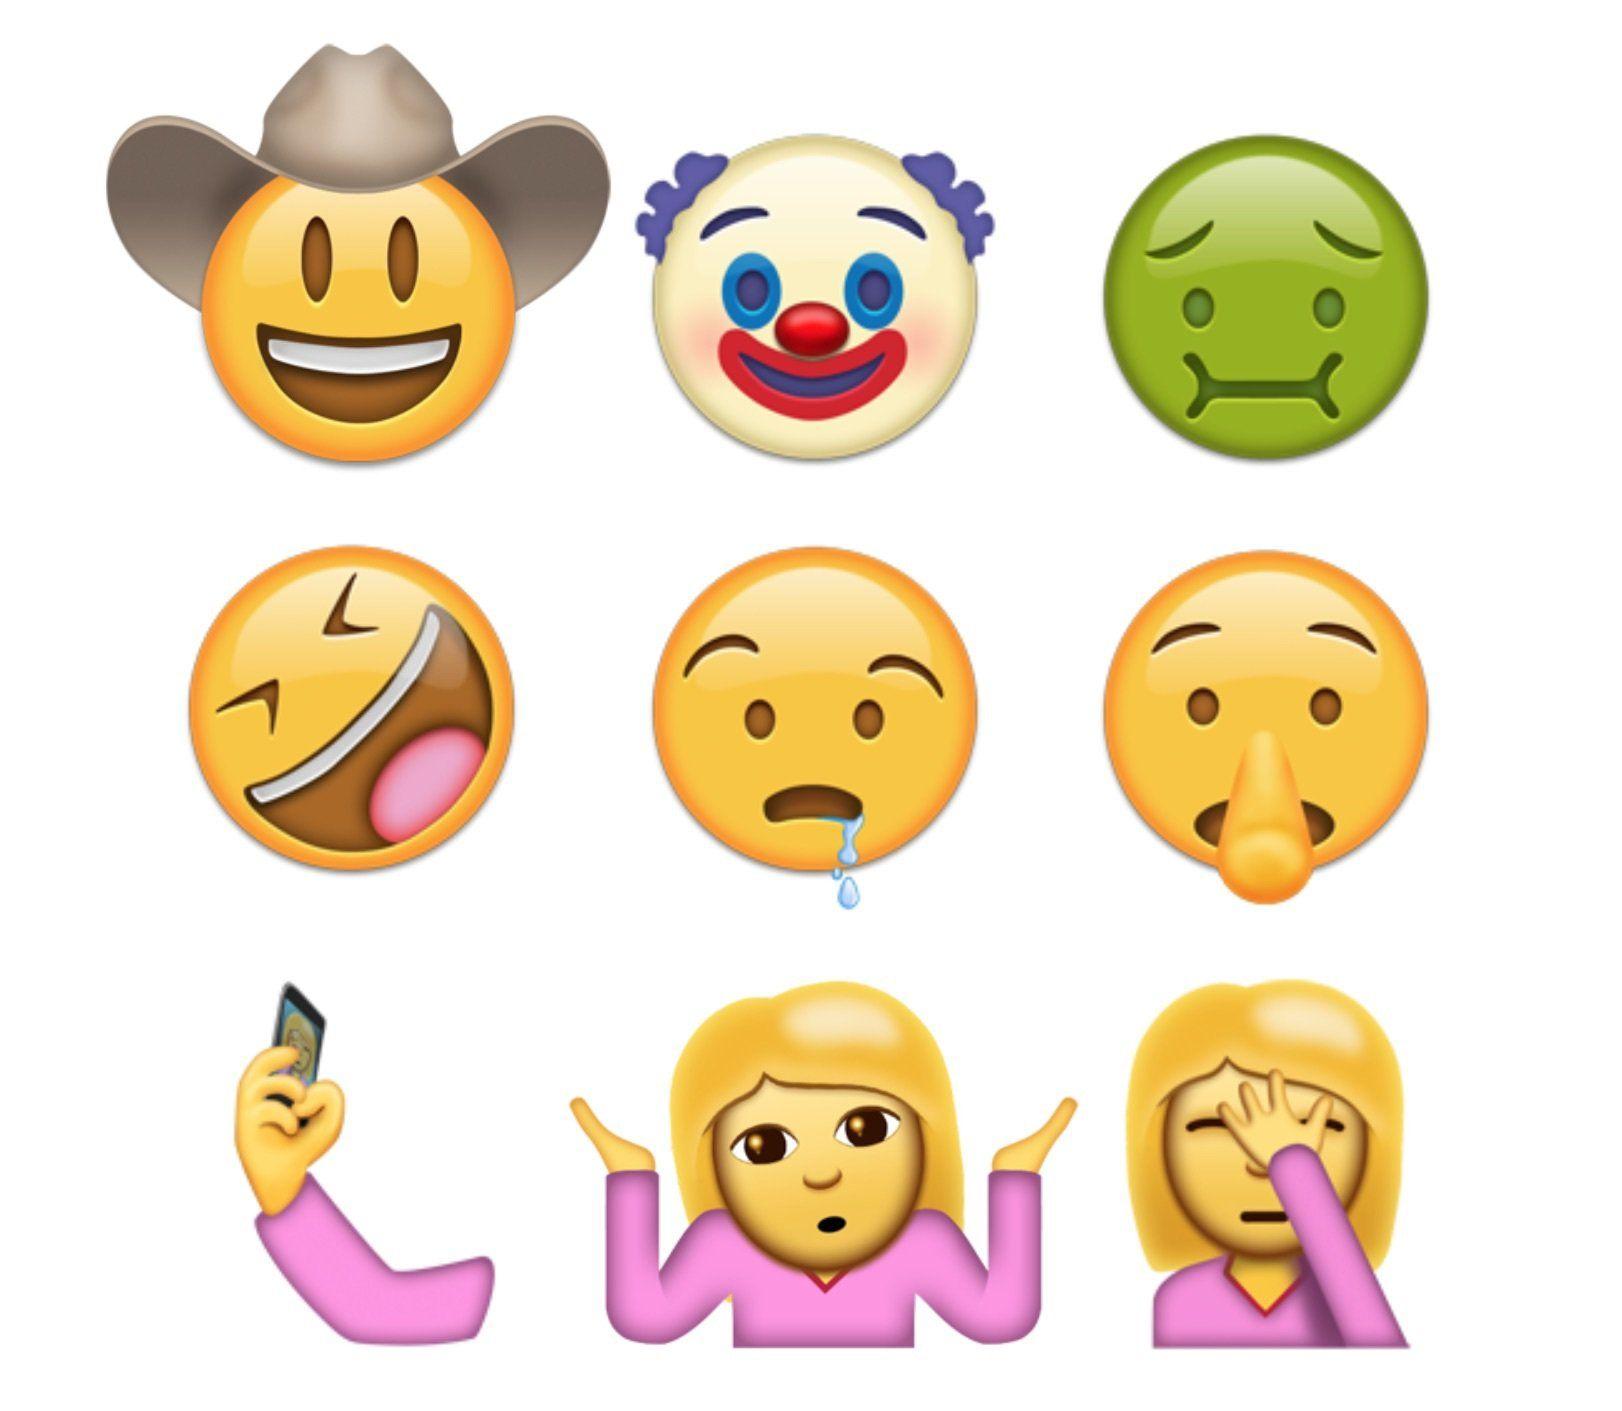 10-20-15 Emoji candidates